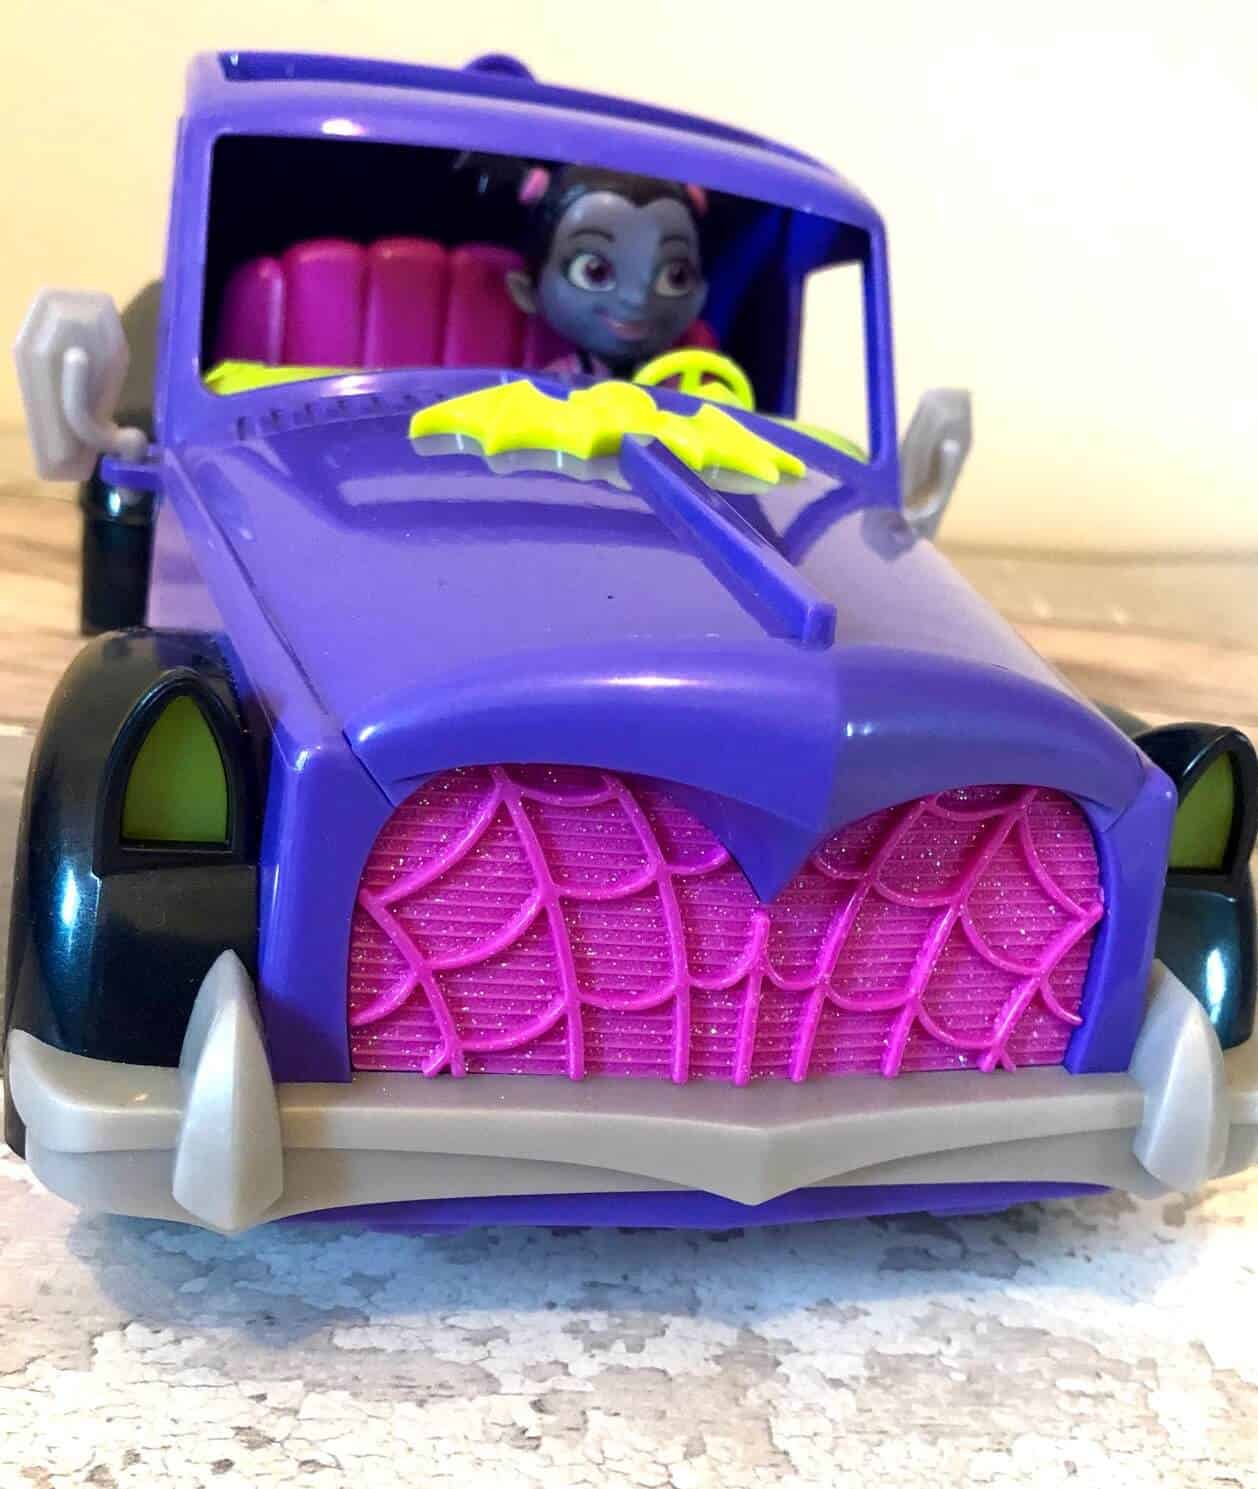 Vampirina Hauntley's Mobile Vehicle transforms into a spook-tacular drive-in cinema. .